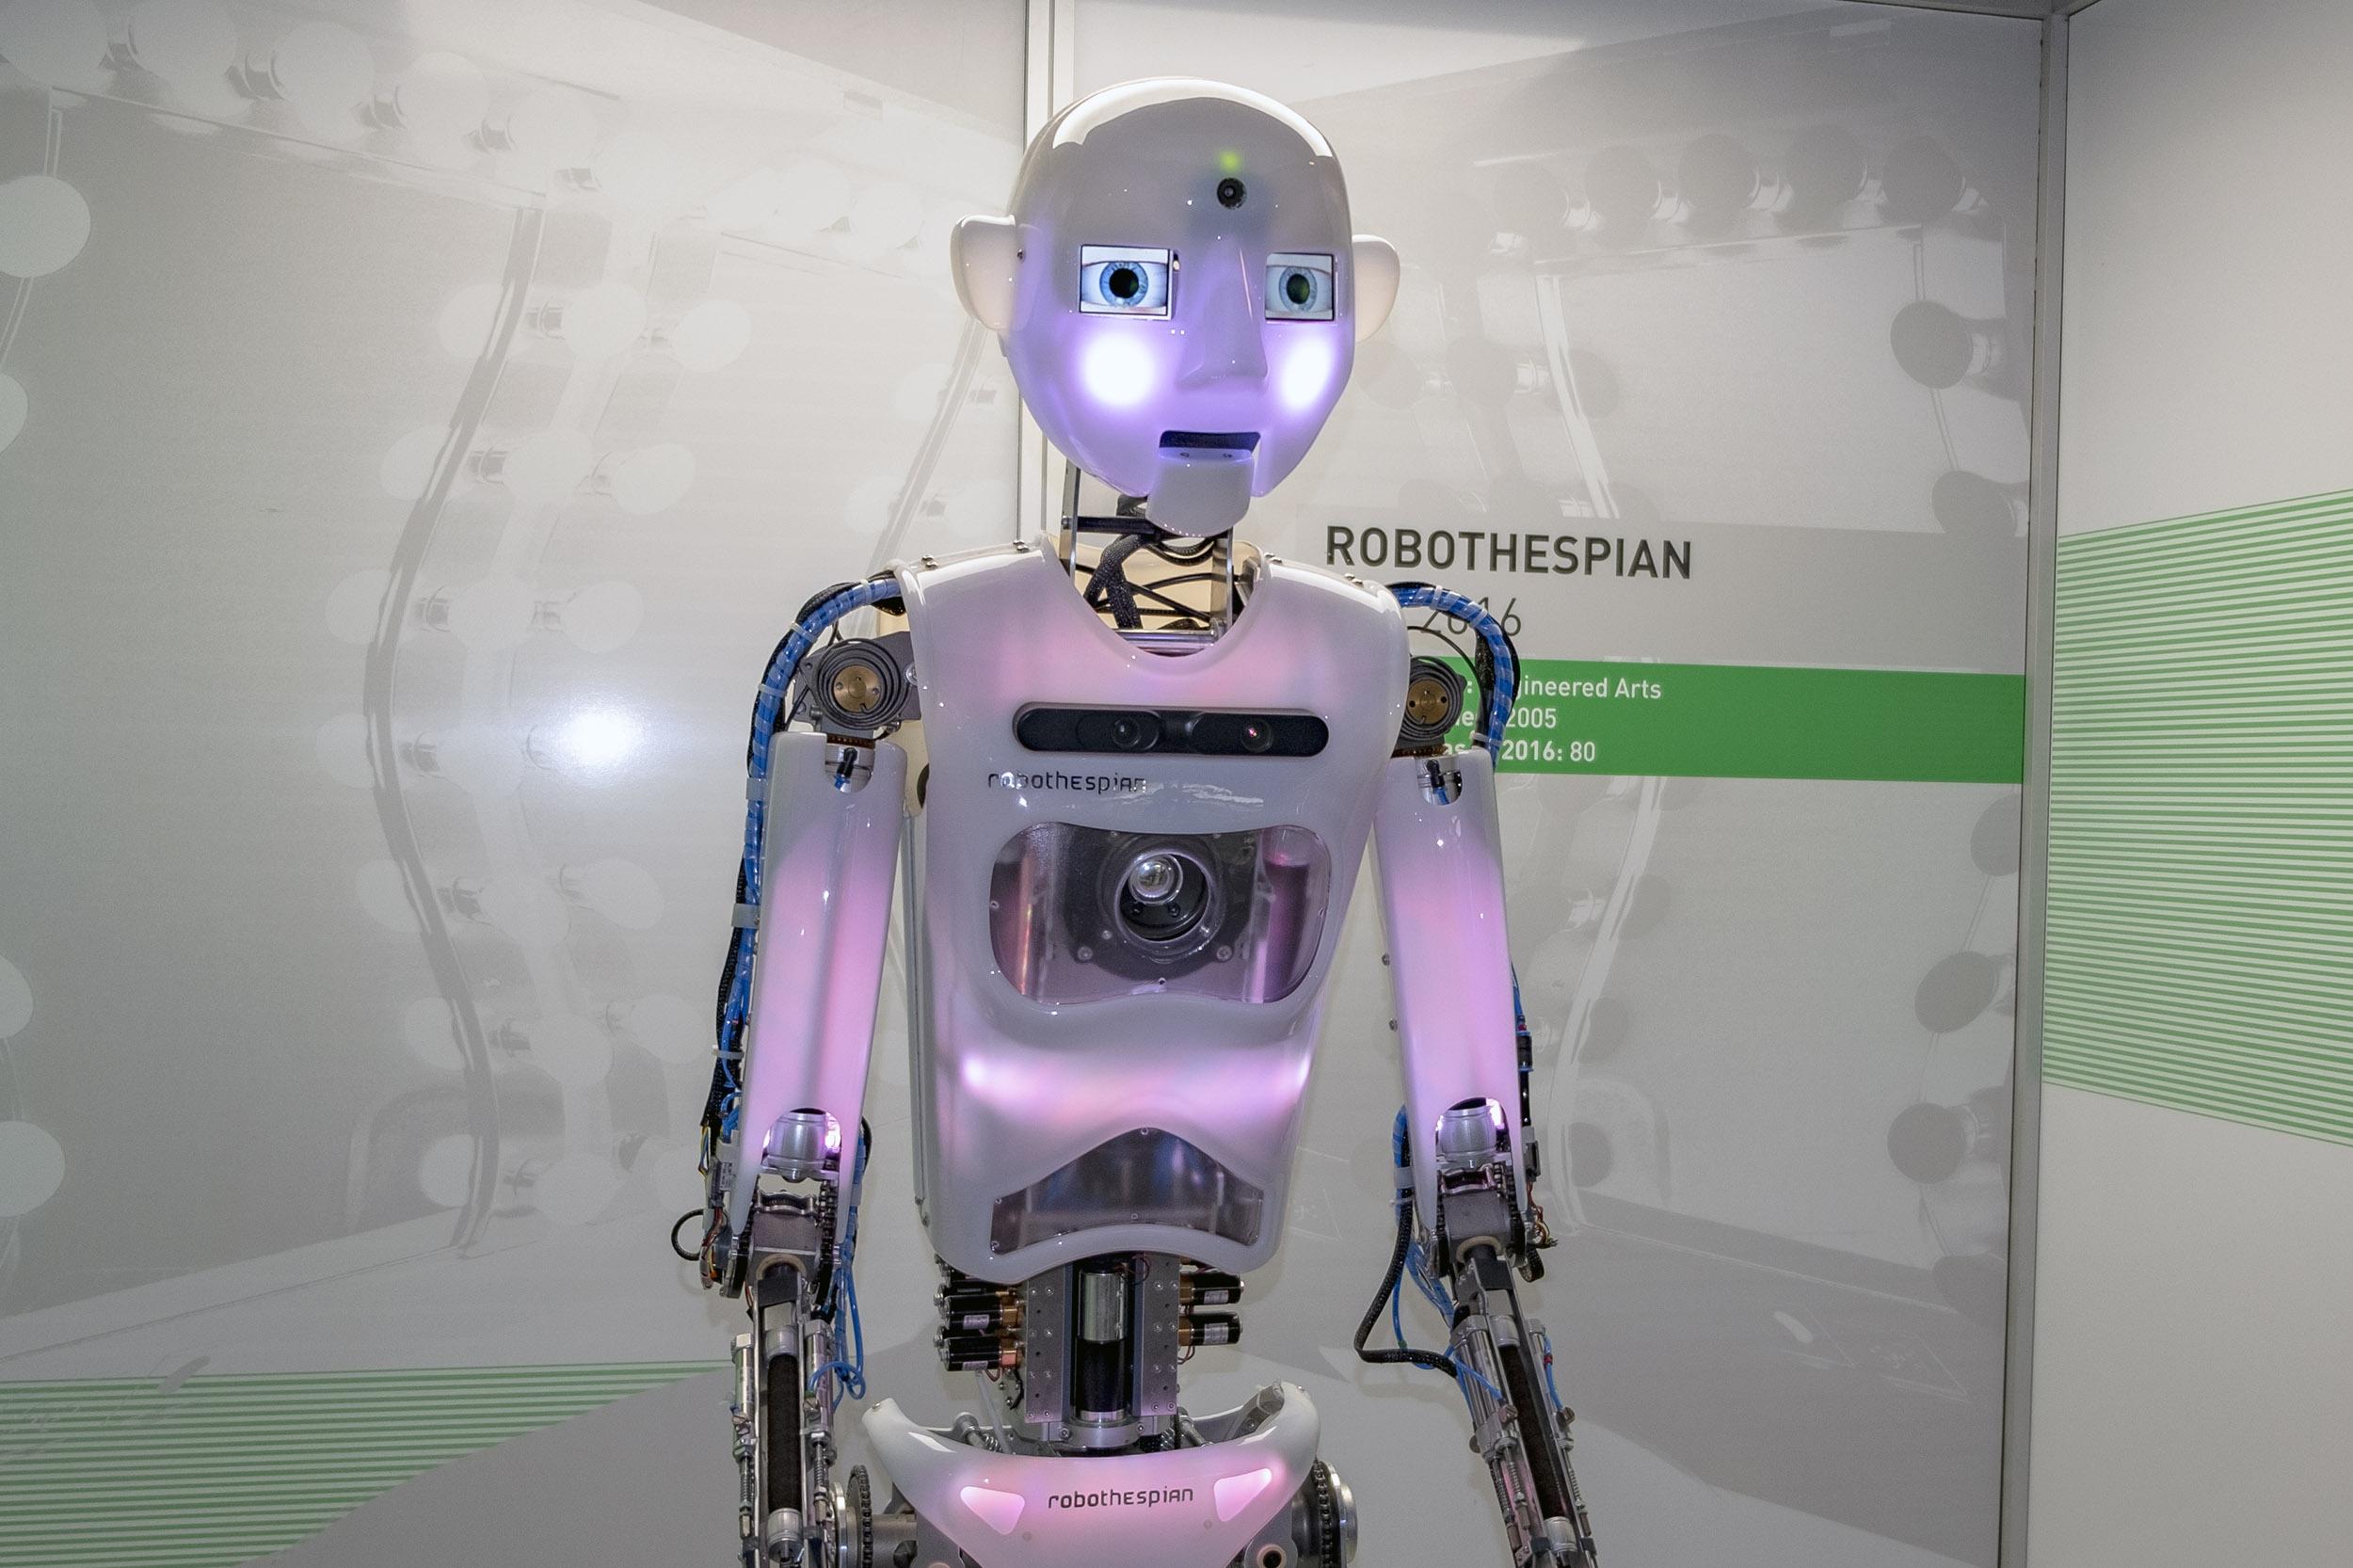 robothespian Tekniska museet